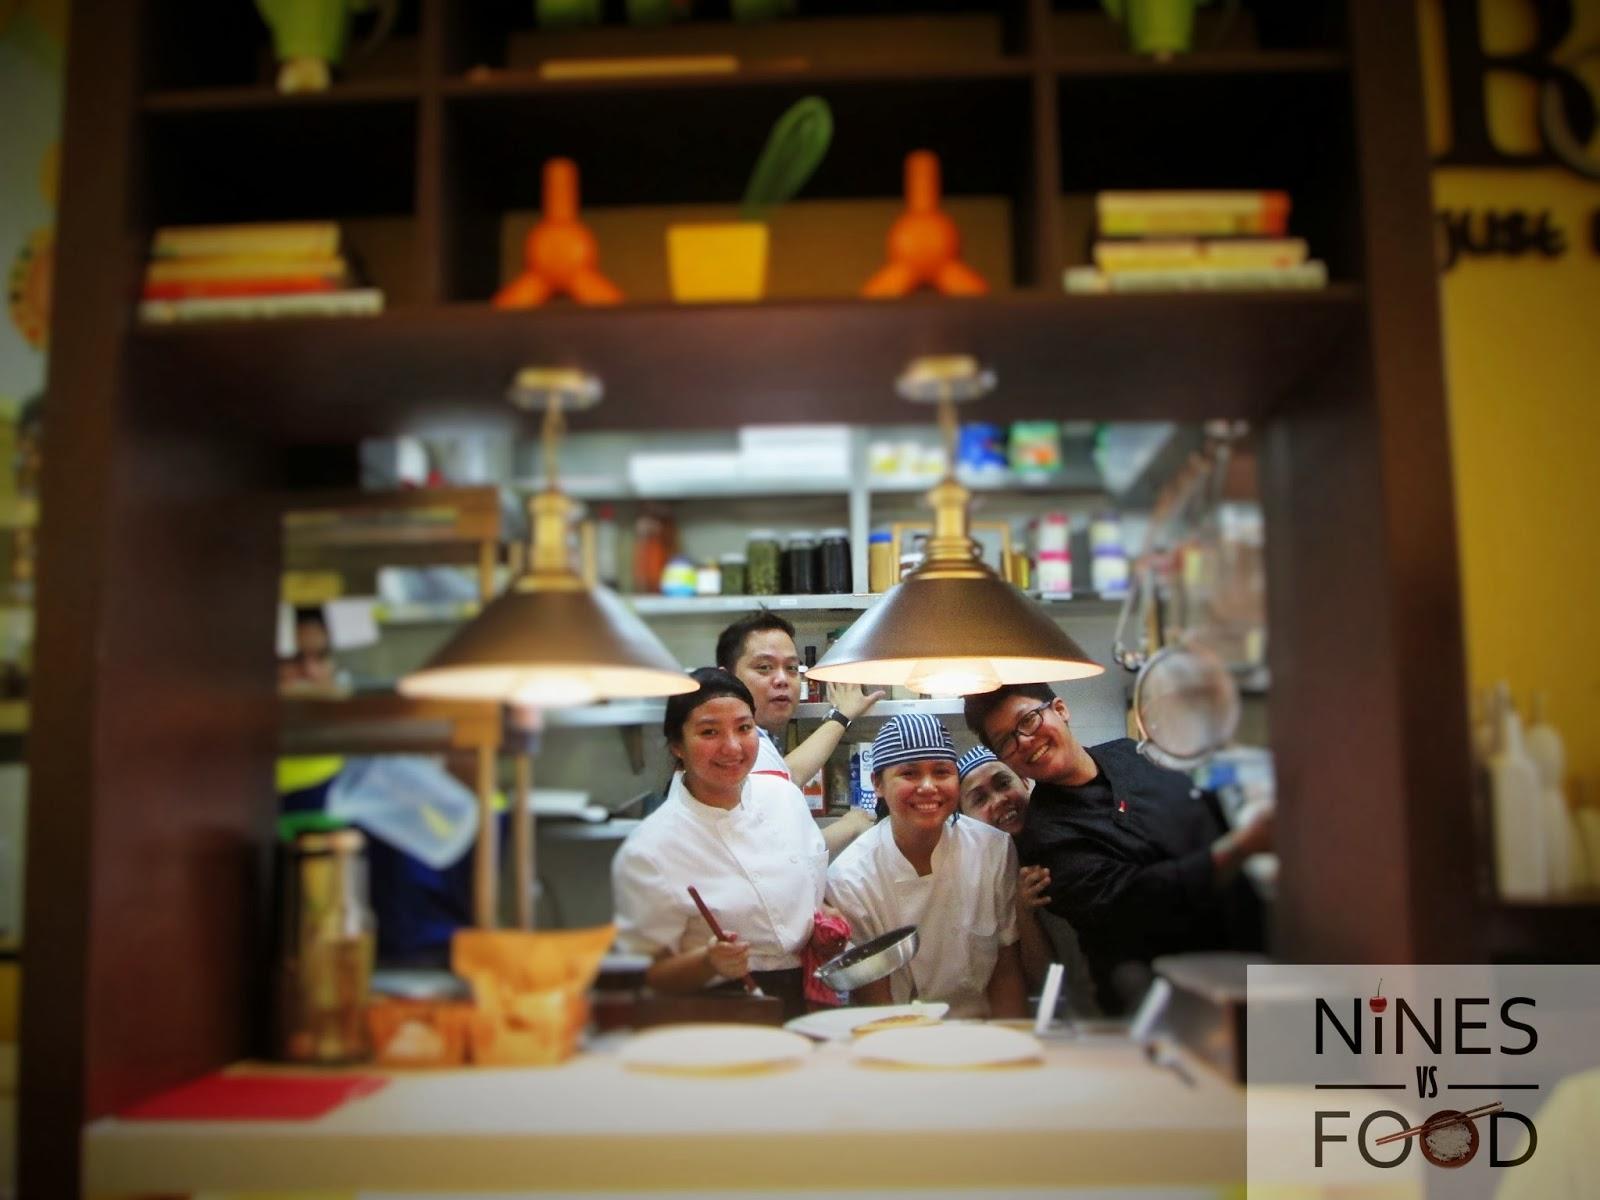 Nines vs. Food - B&P Shaw Mandaluyong-6.jpg